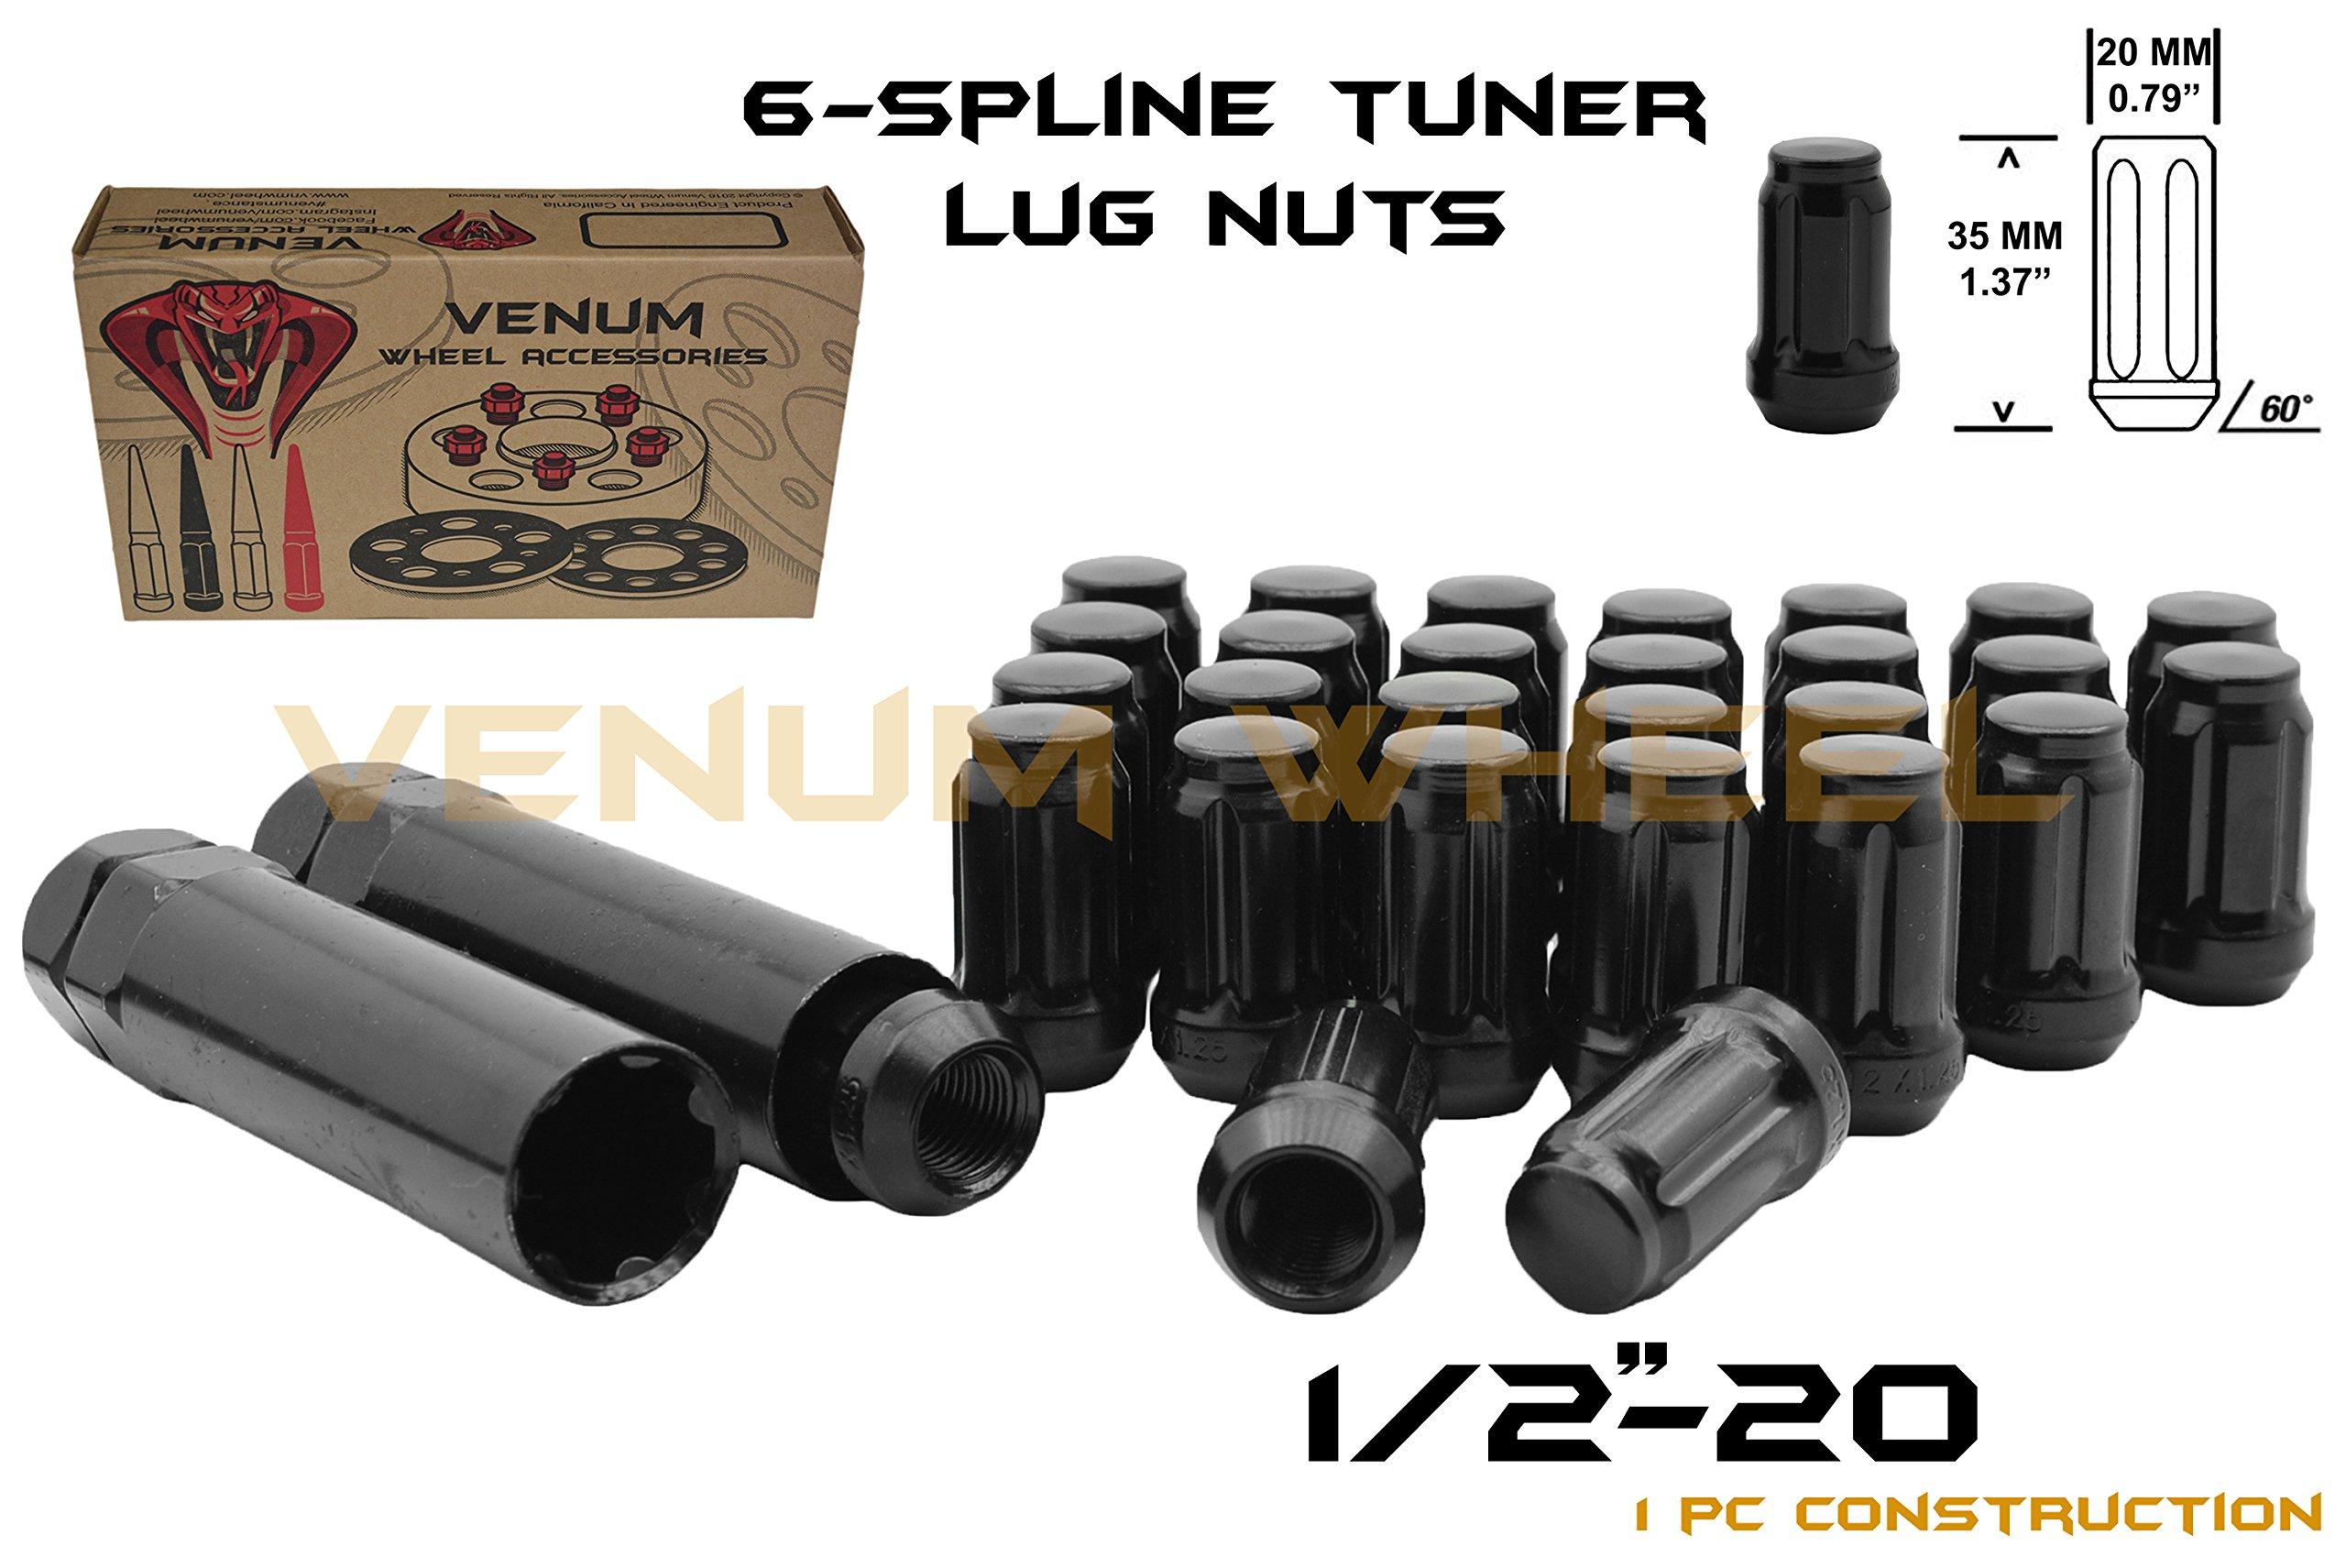 (24) 1/2-20'' Black 6 Spline Security Lug Nuts with Two Locking Socket Keys | Fits Dodge Durango Viper 1998-2003 Aftermarket Wheels